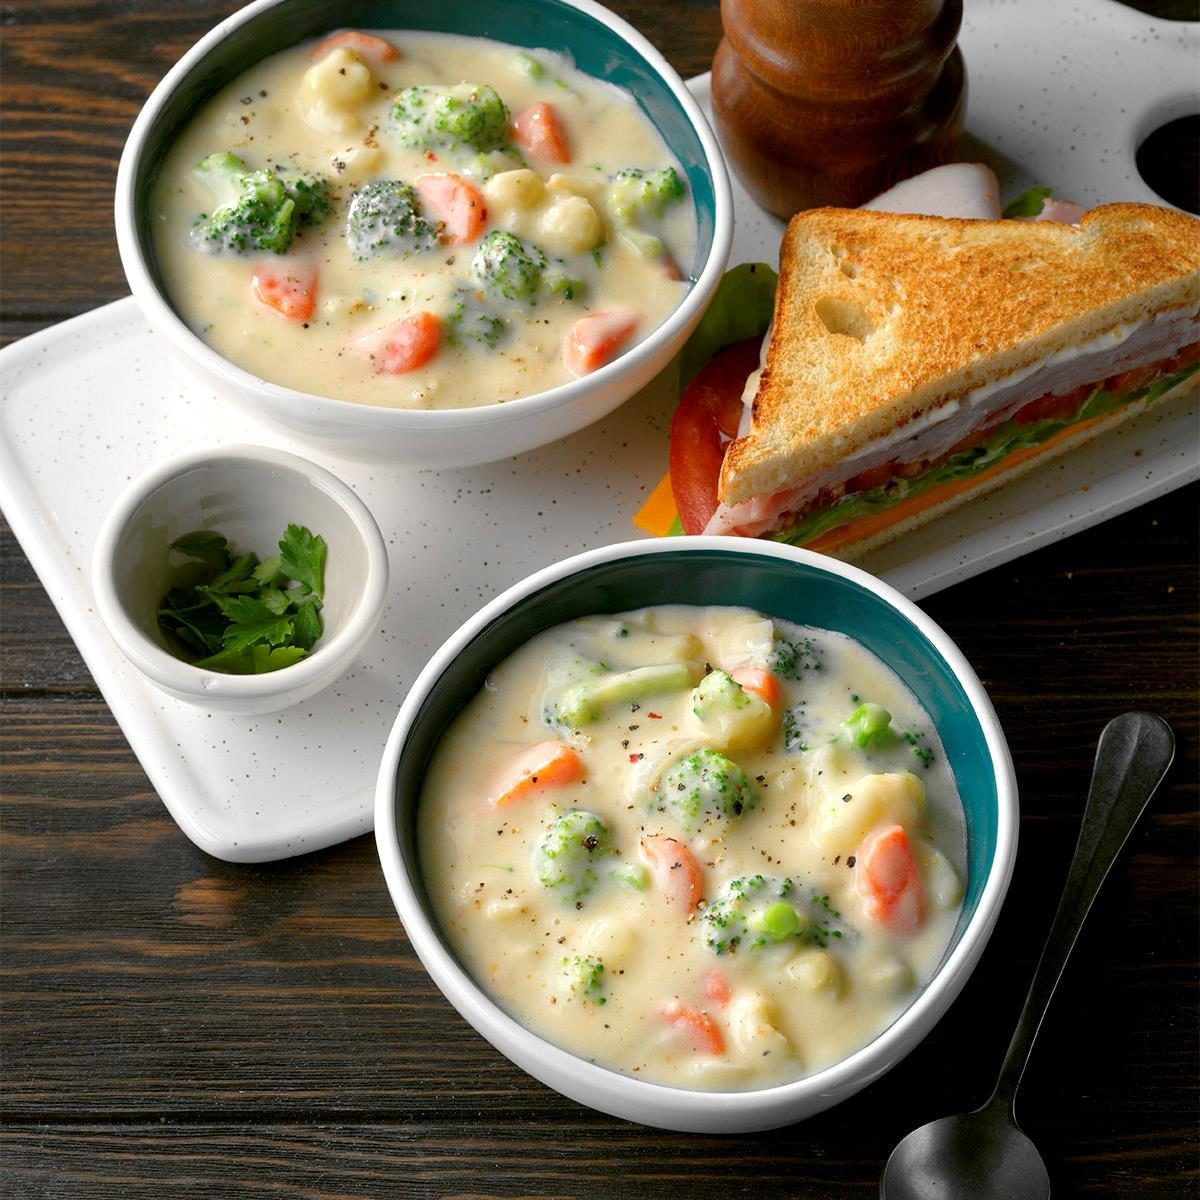 Cauliflower Broccoli Cheese Soup Recipe Hearty Soup Recipes Hearty Soups Broccoli Cheese Soup Recipes